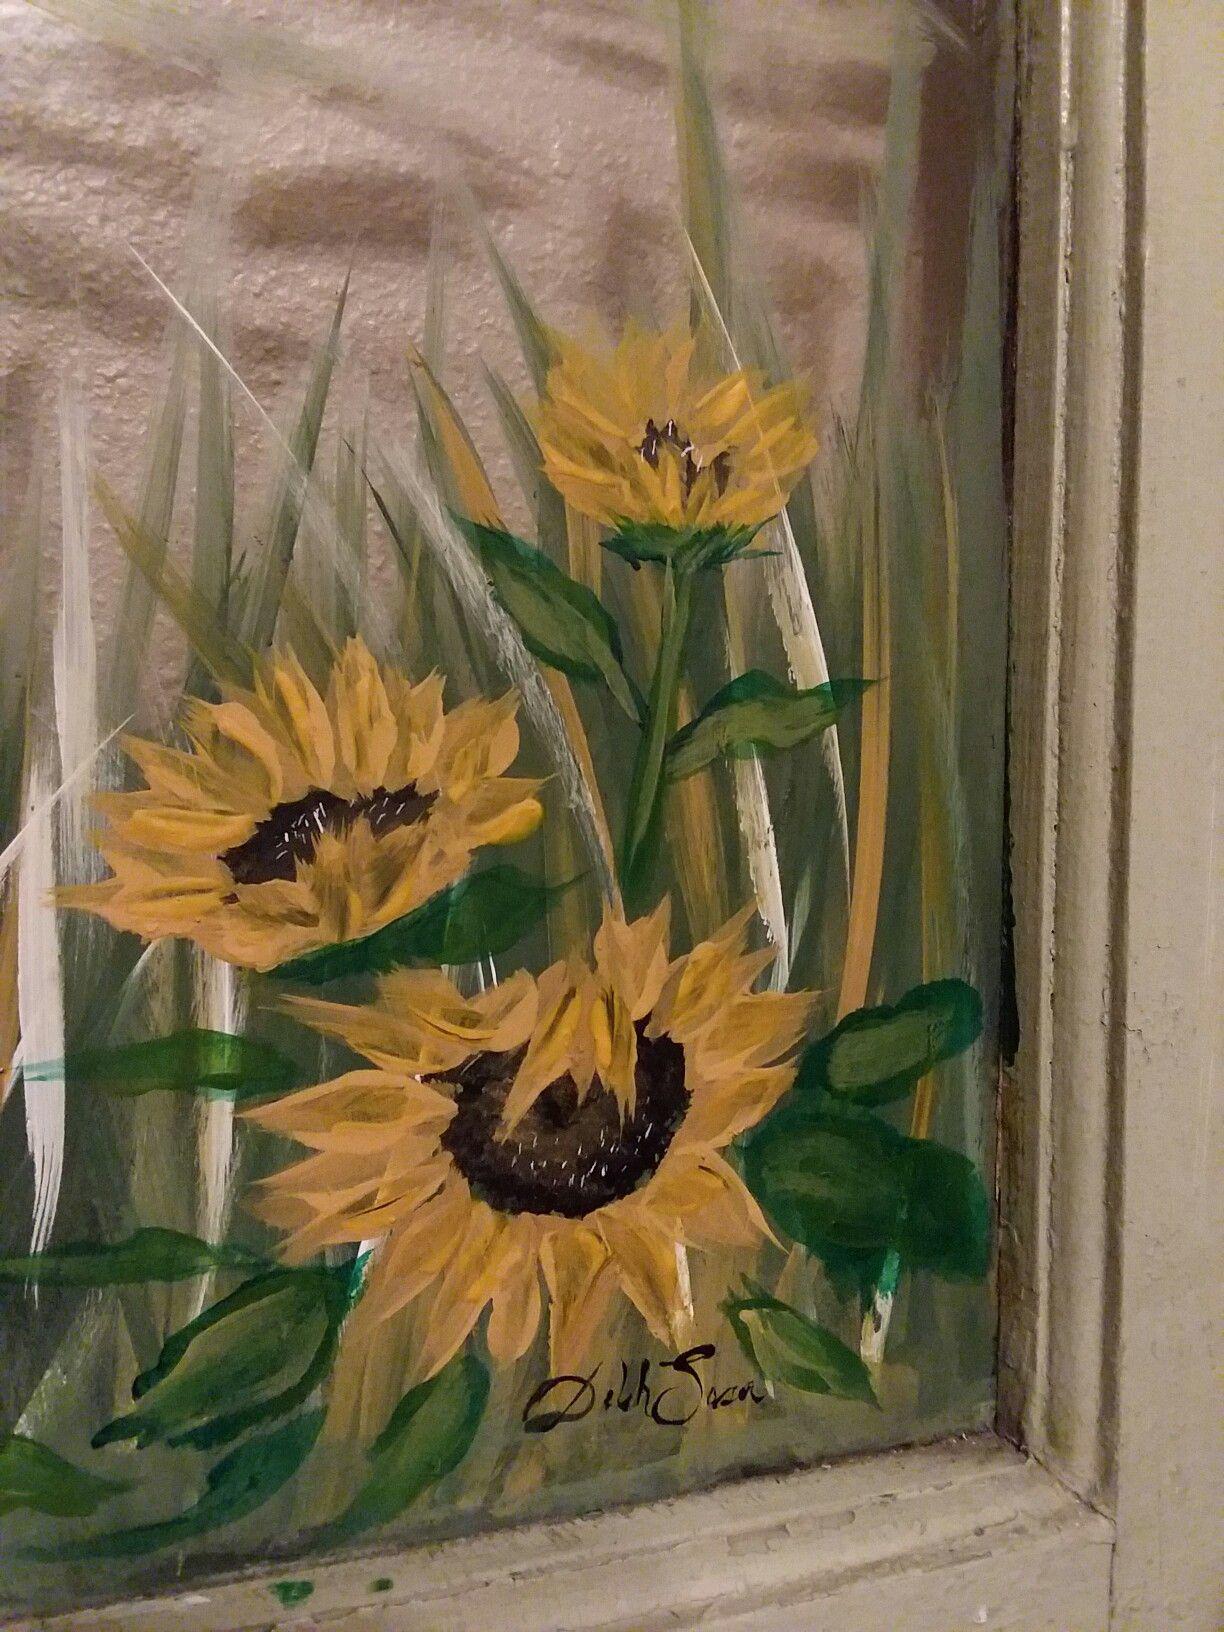 Desodesigns find me on instagram and fb sunflowersglass